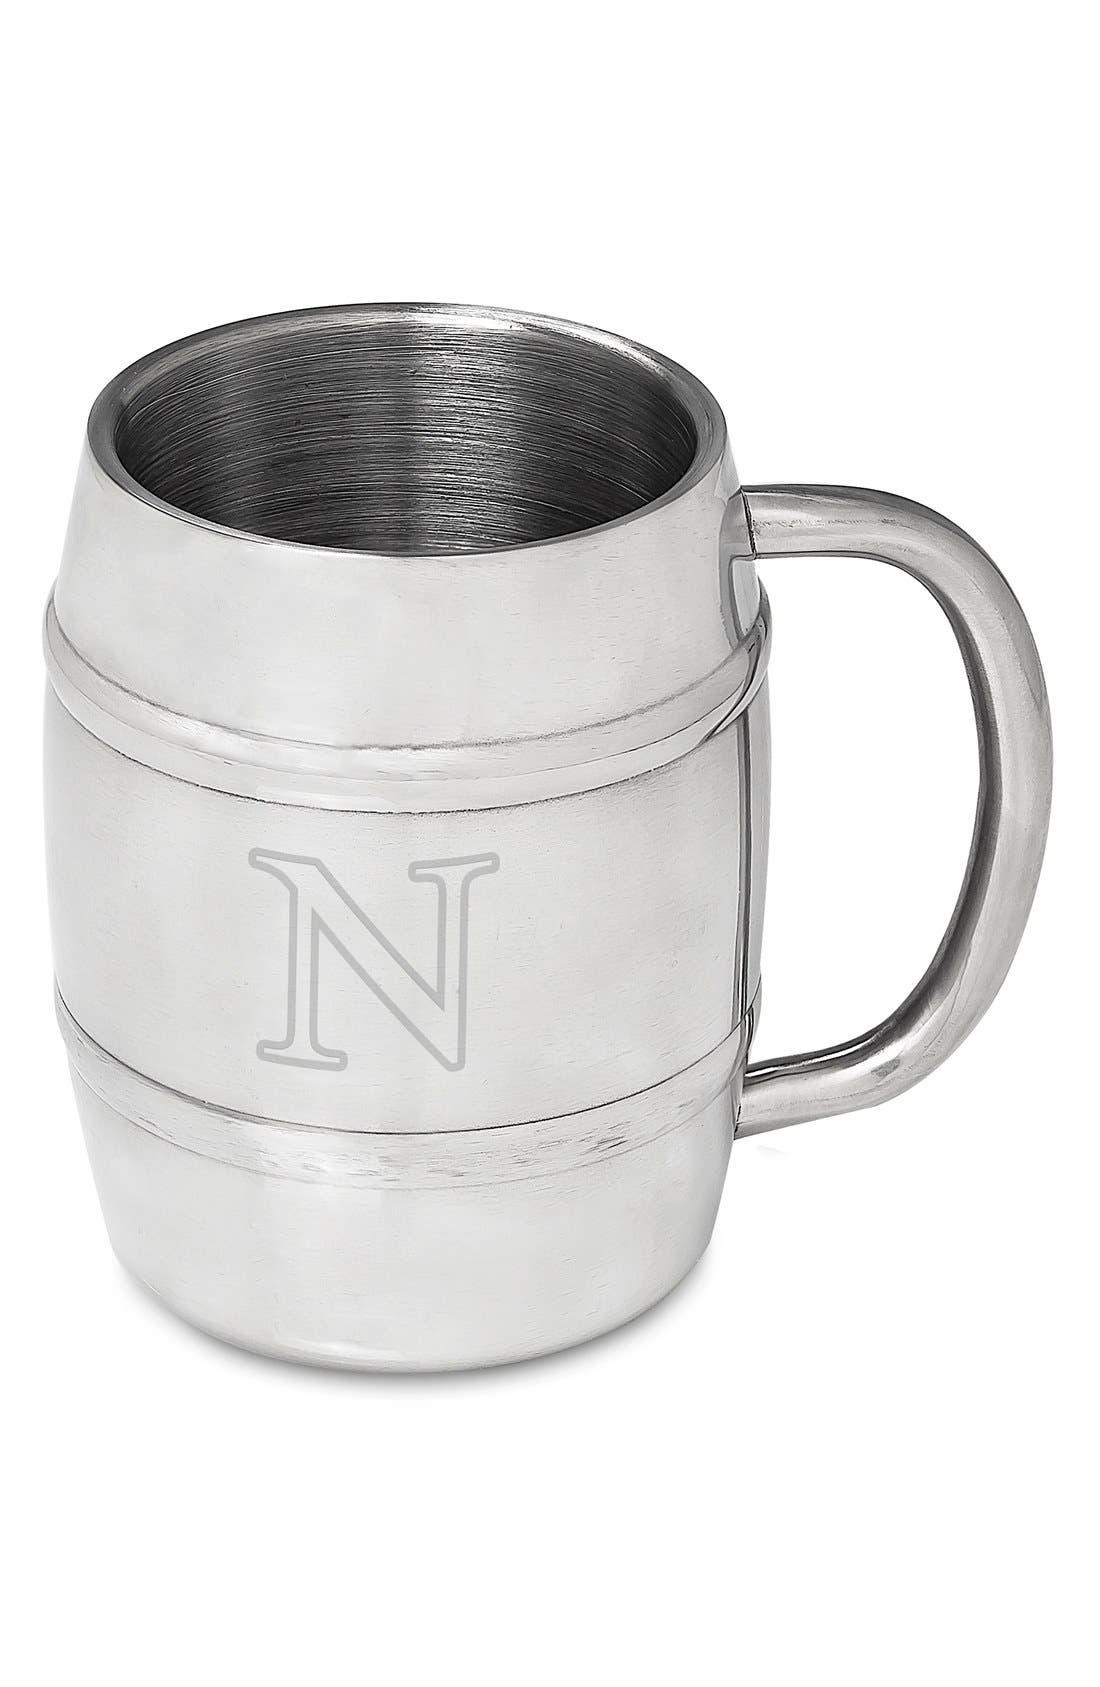 Monogram Stainless Steel Keg Mug,                             Main thumbnail 16, color,